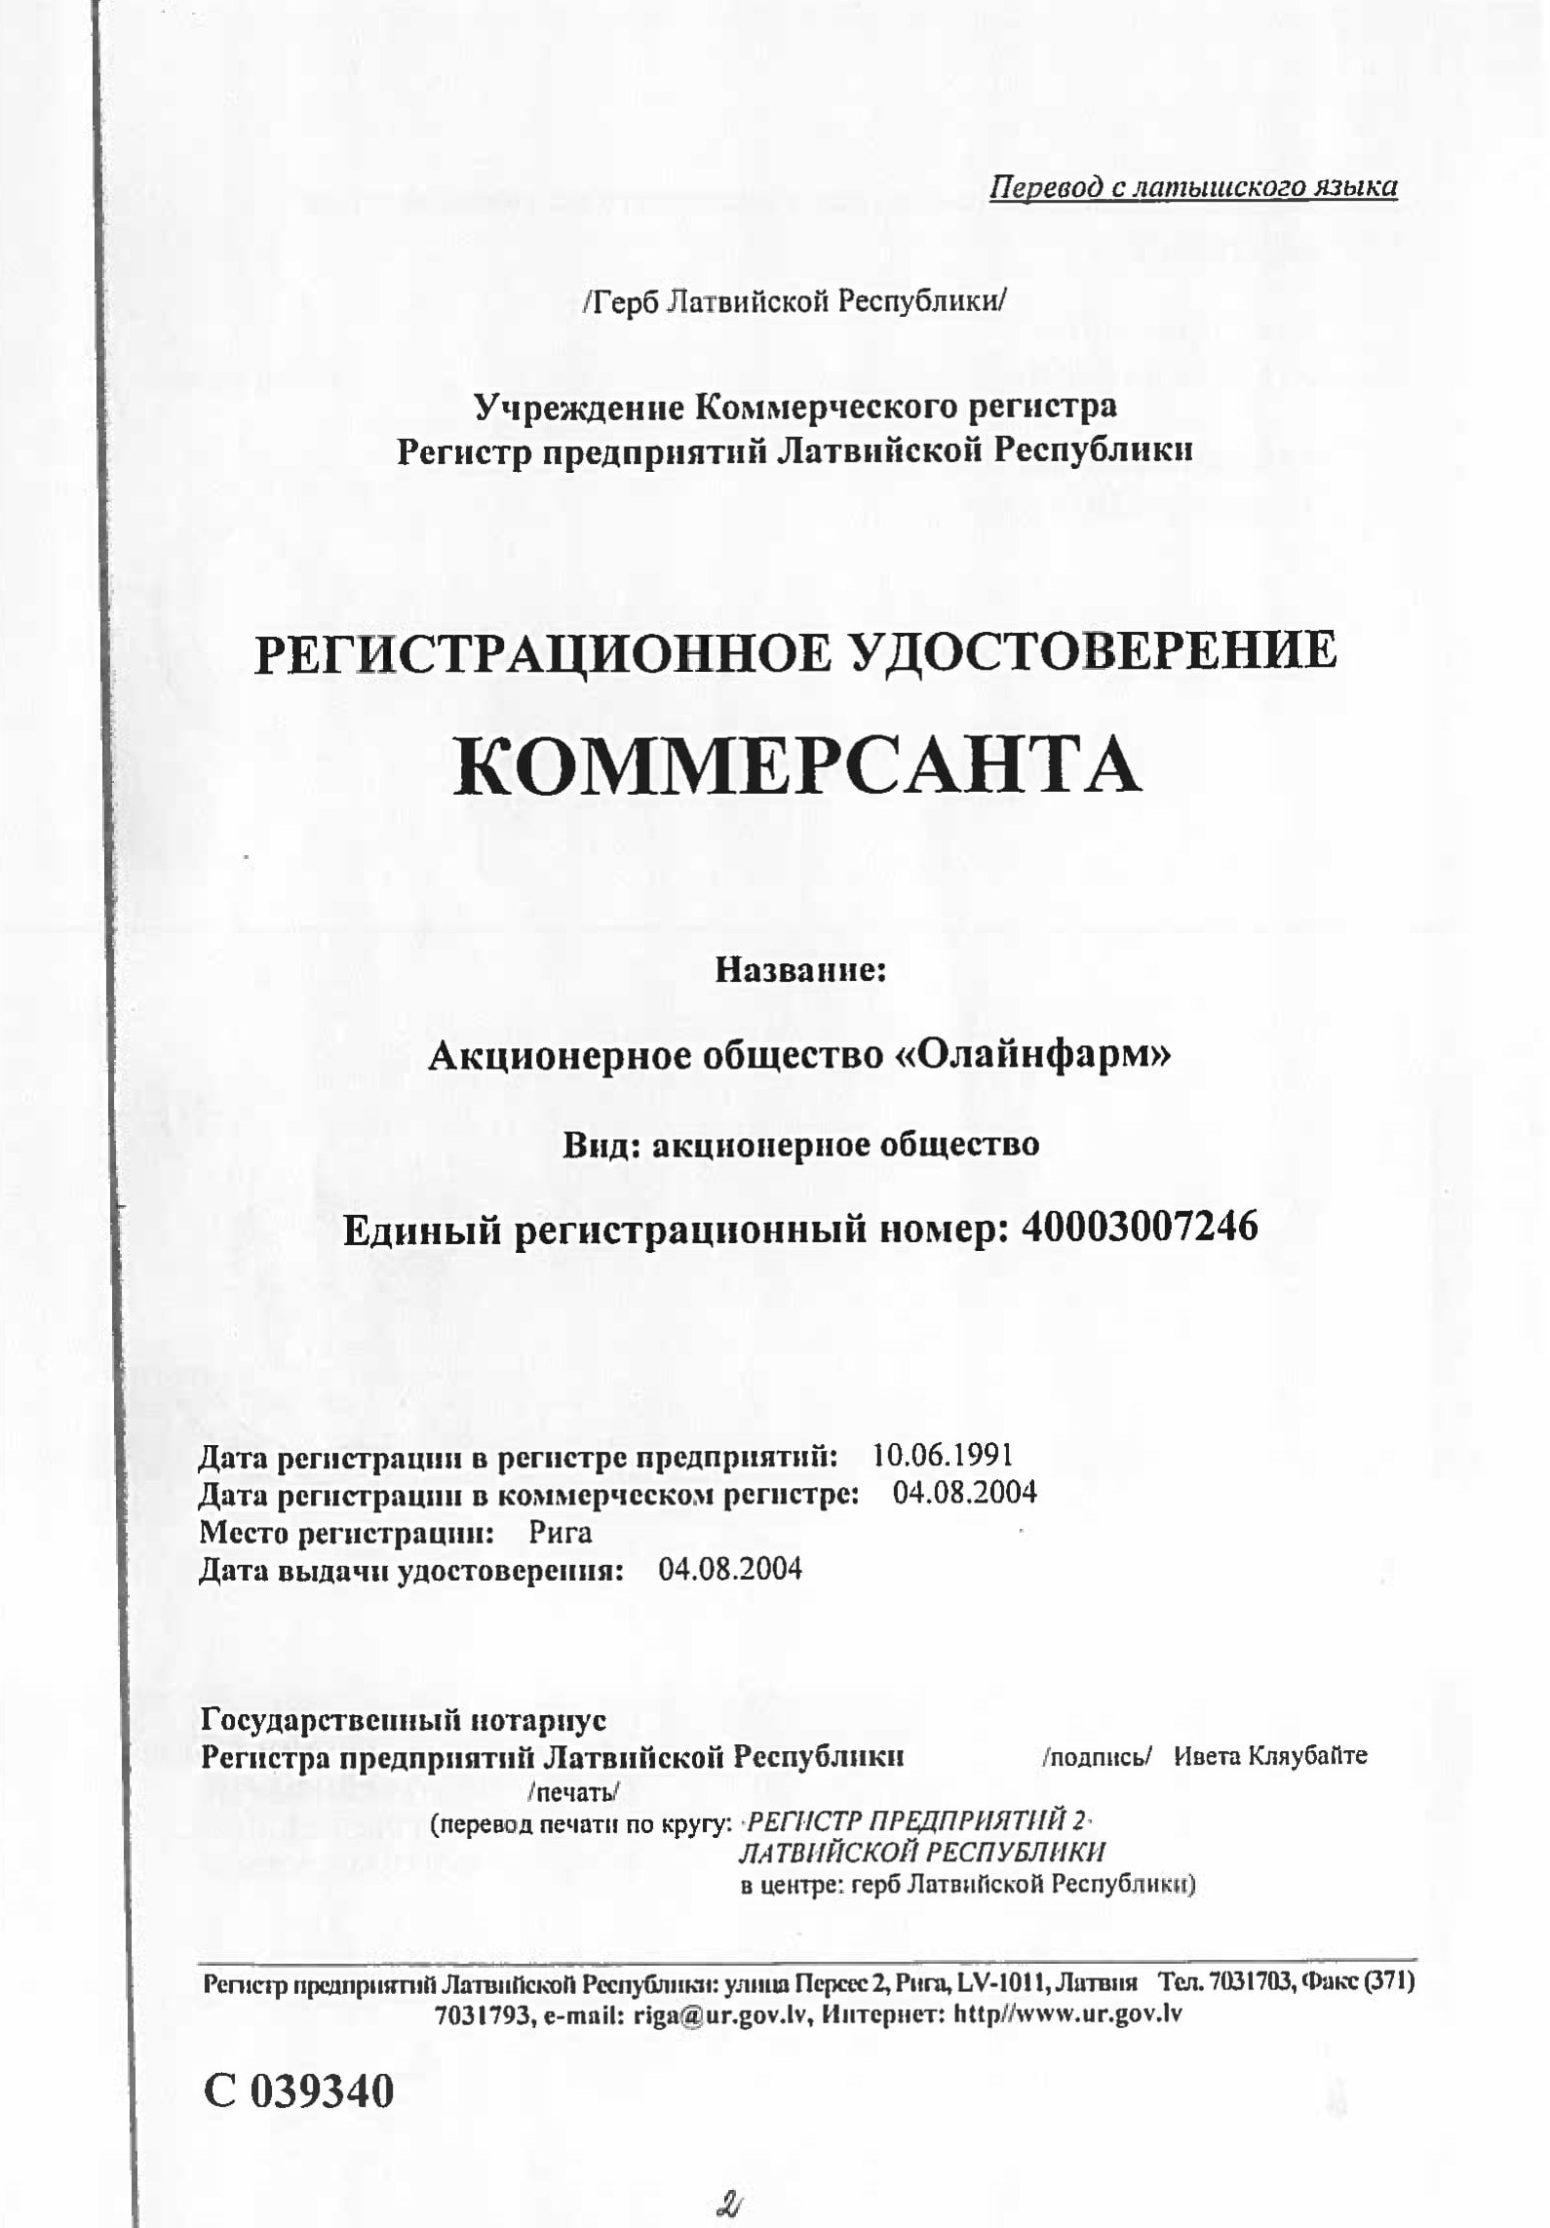 Registracionnoe-udostoverenie-Olaynfarm-3